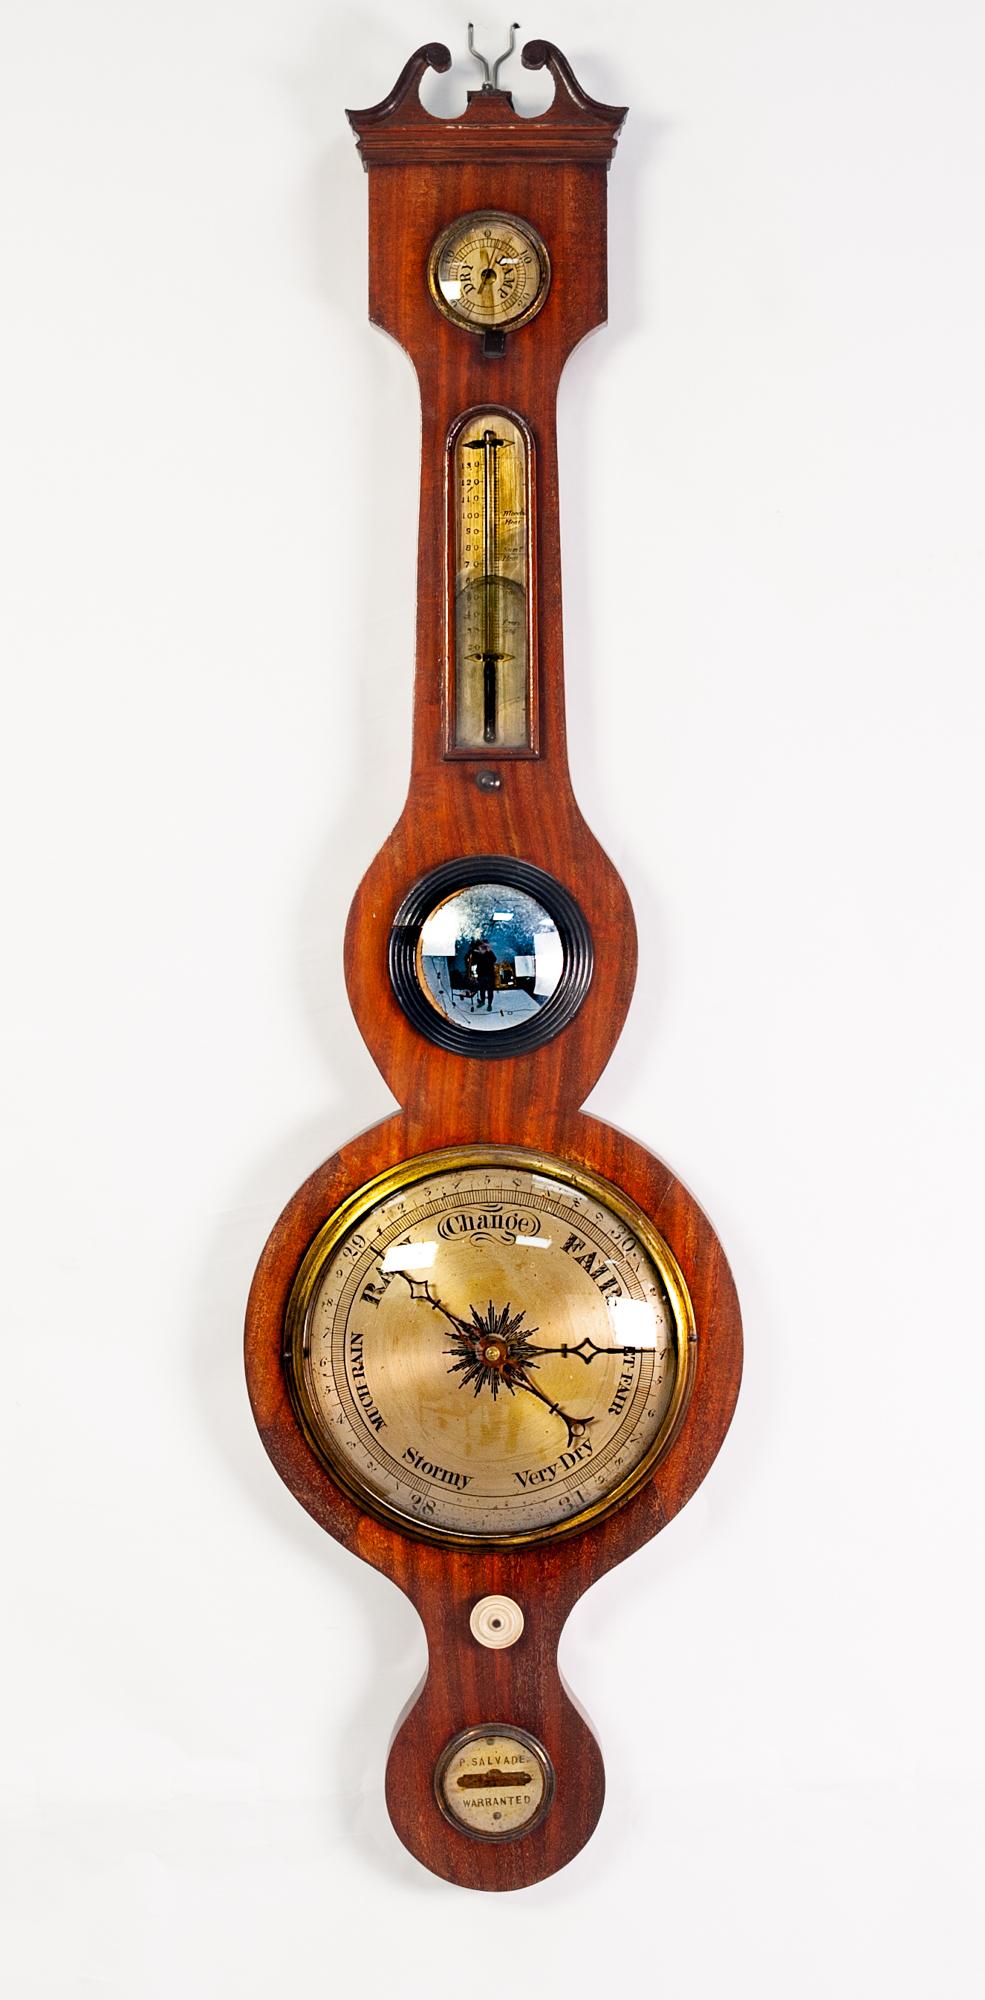 Lot 74 - A NINETEENTH CENTURY MAHOGANY CASED BANJO WHEEL MERCURY TABLE BAROMETER by P. Salvade, with